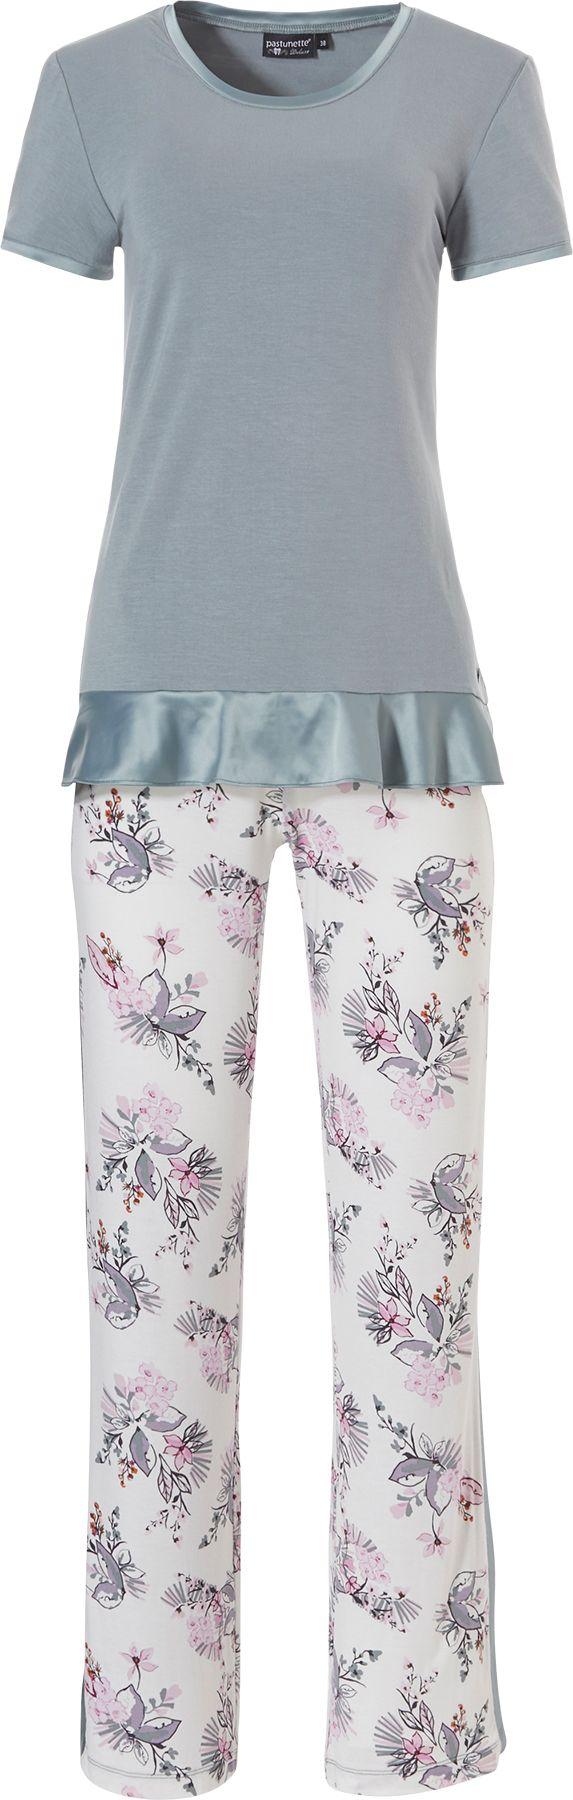 fa9f1f32b672b56203890918fb606808 - Dames Pyjama Met Korte Broek